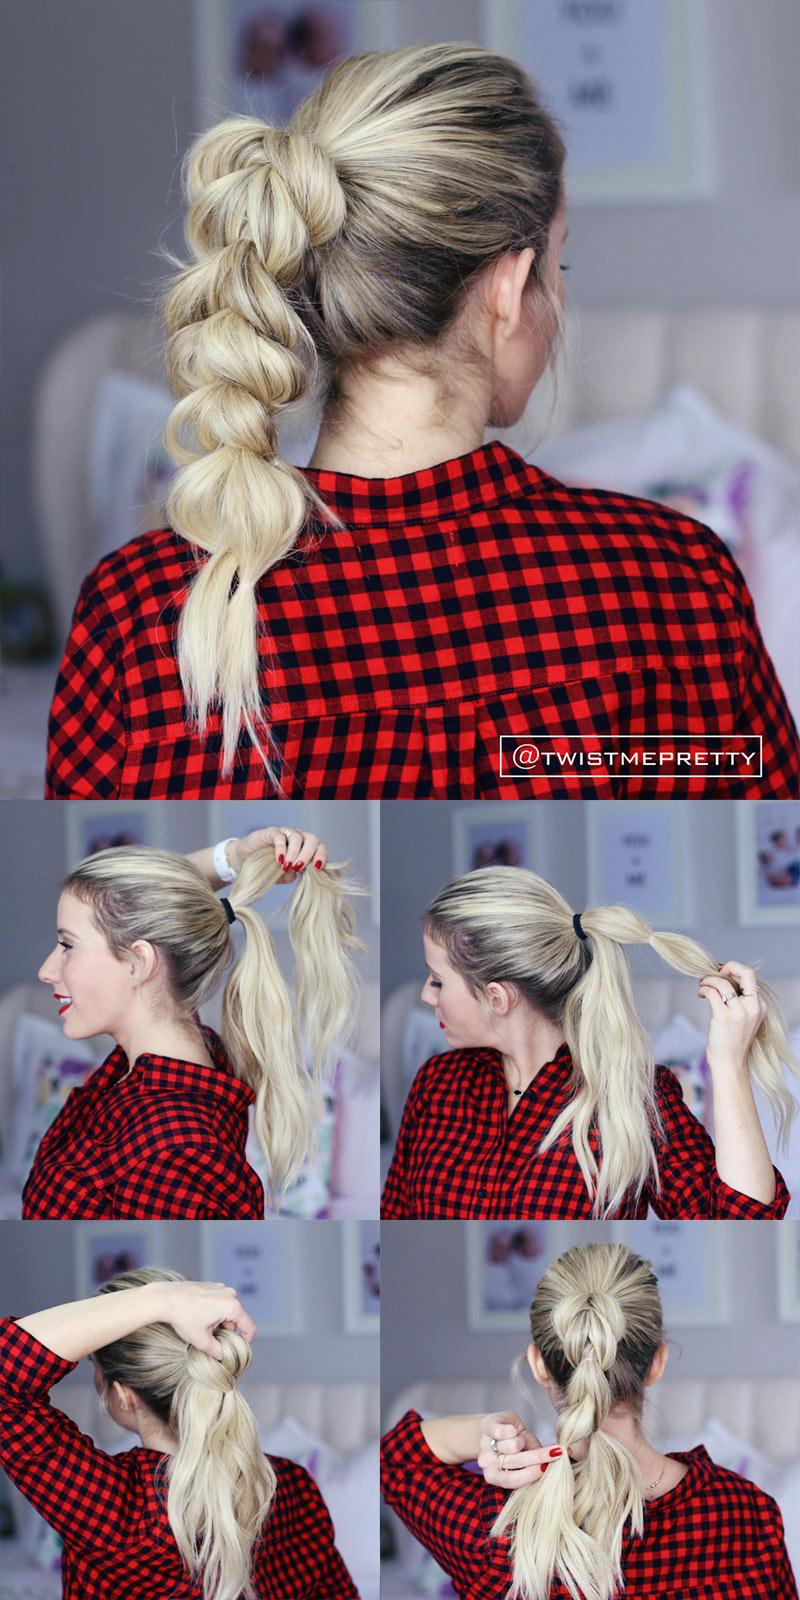 Strange 4 Hairstyles For Dirty Hair Twist Me Pretty Natural Hairstyles Runnerswayorg